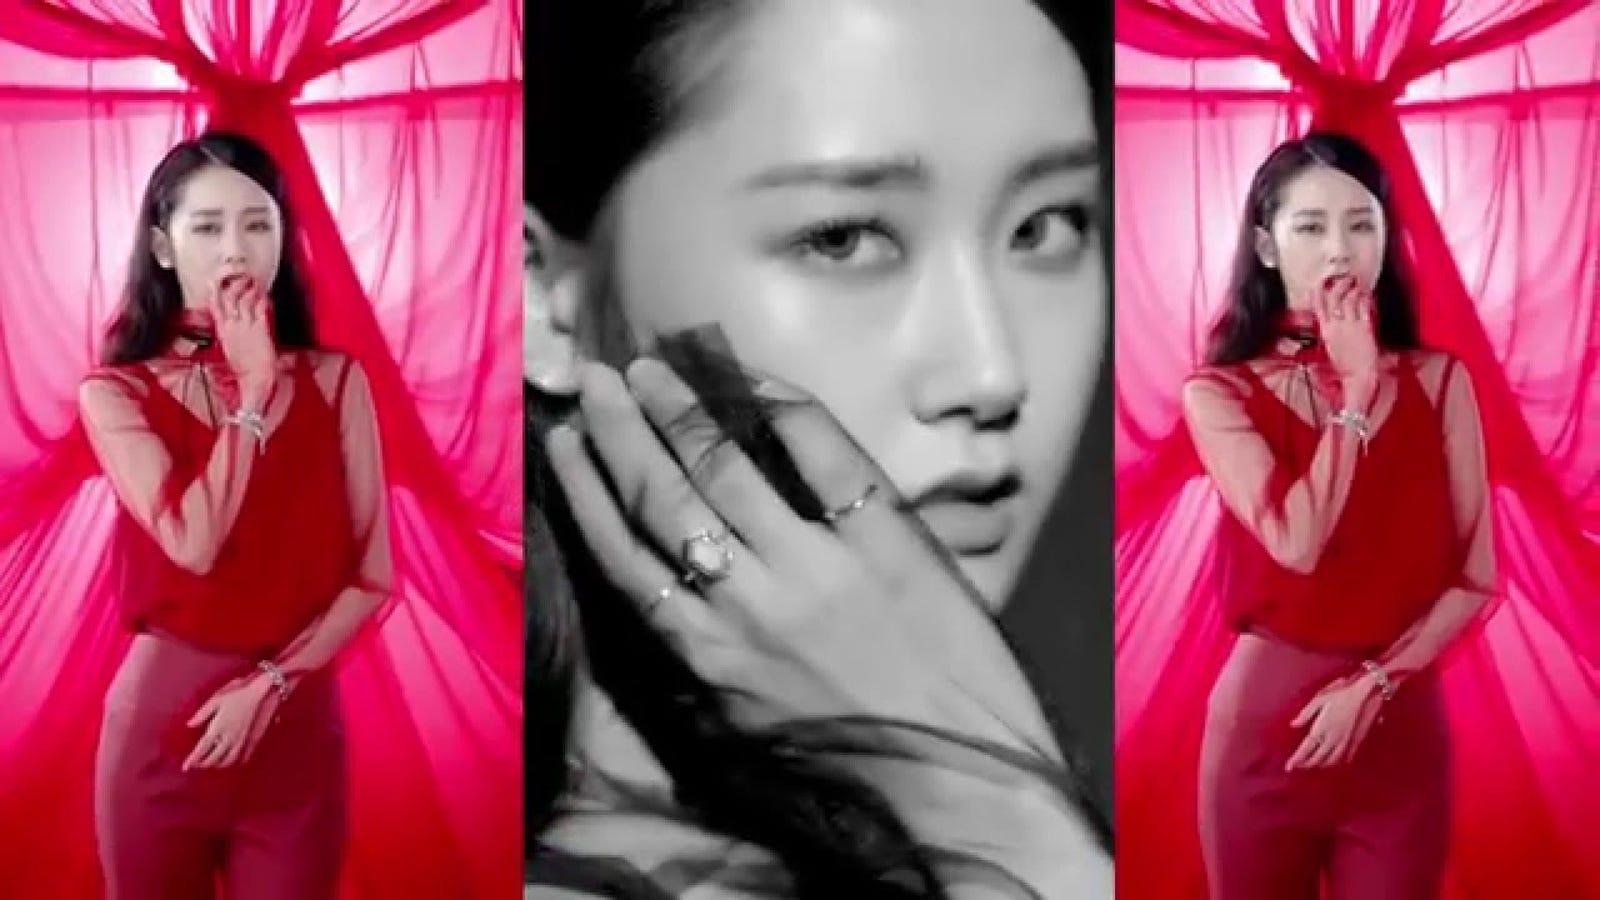 Hyuna red kpop fapmusic